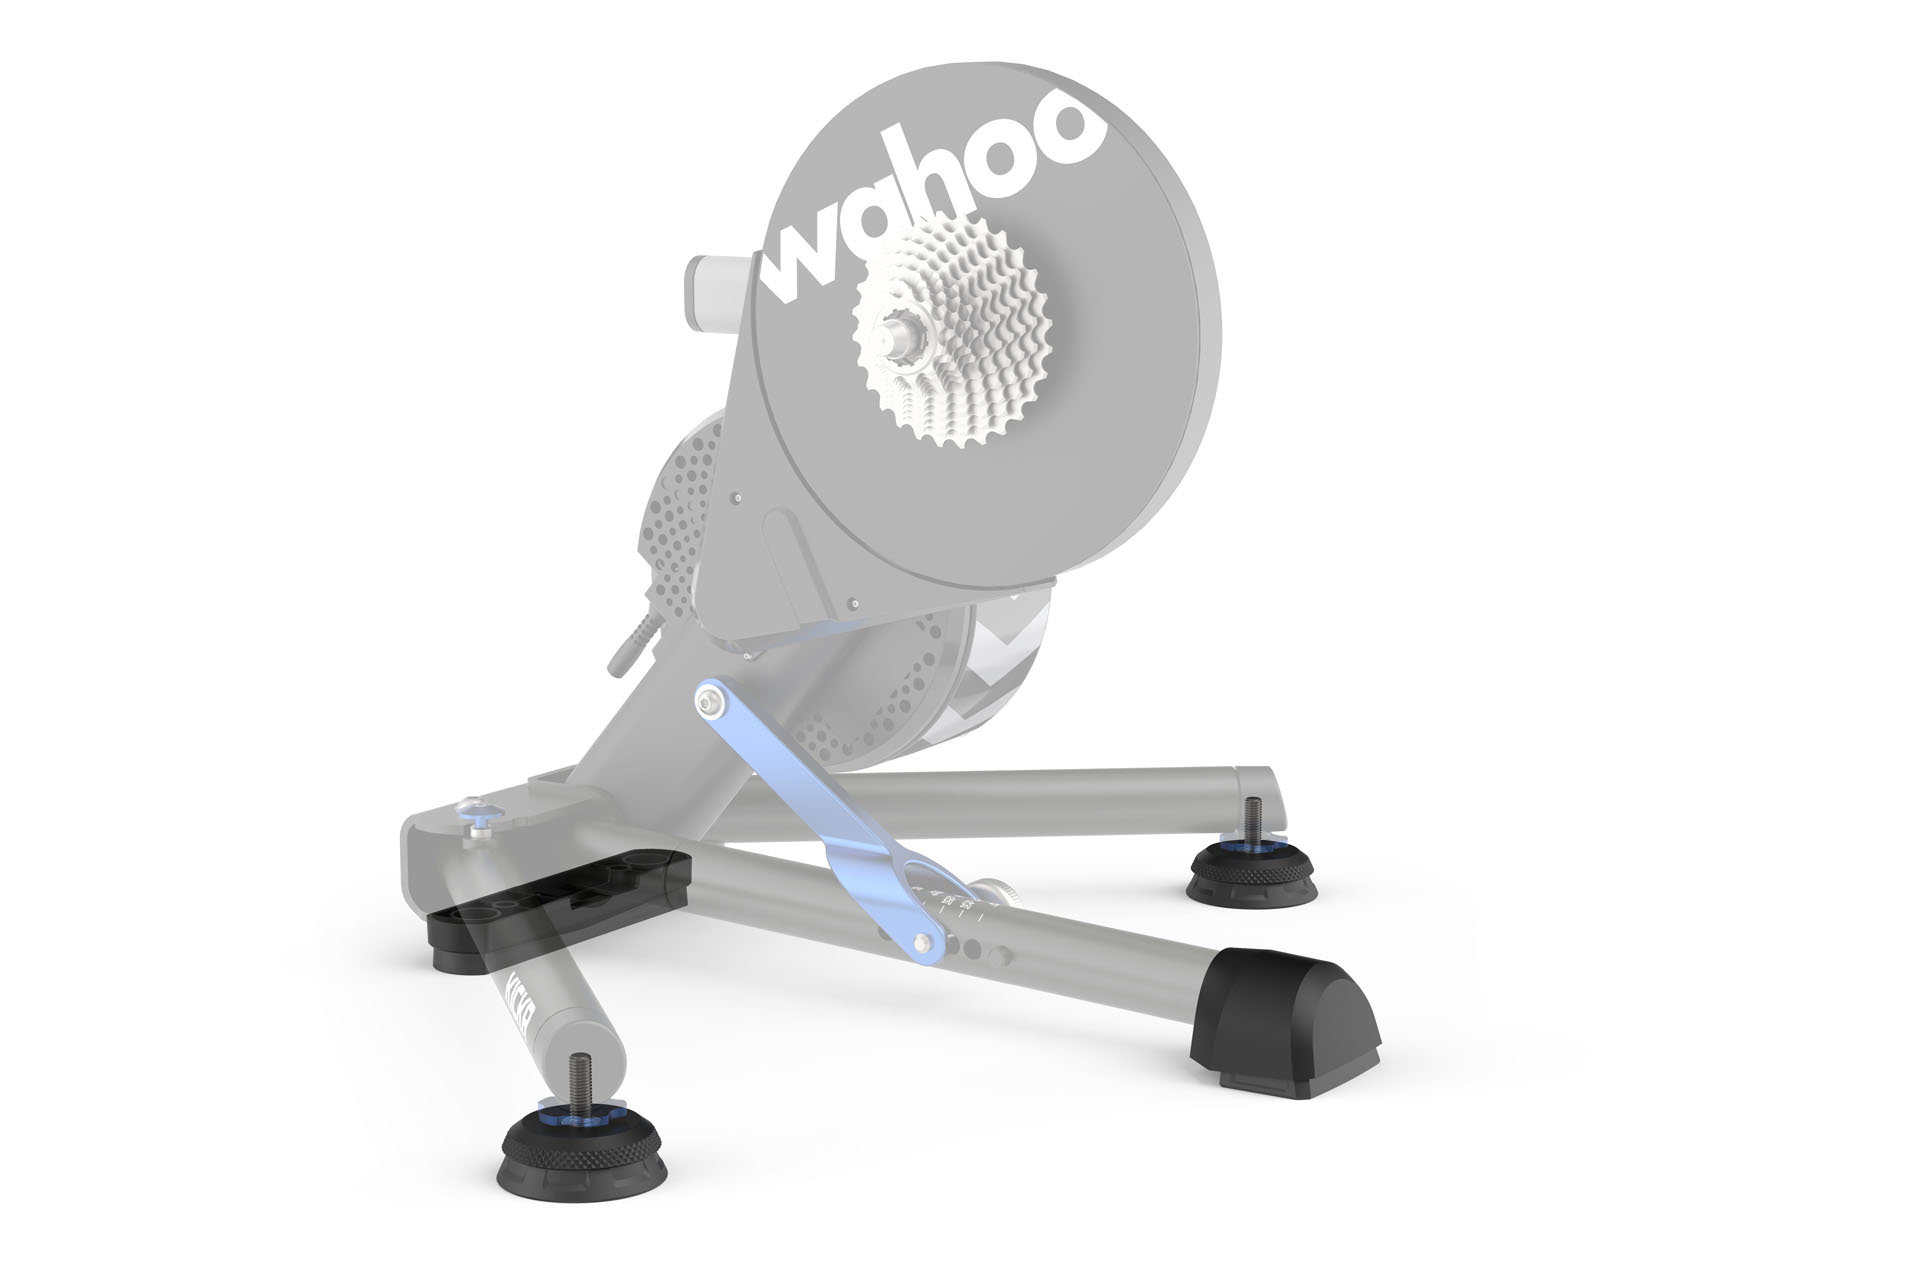 Wahoo-KICKR 2020-Product-11